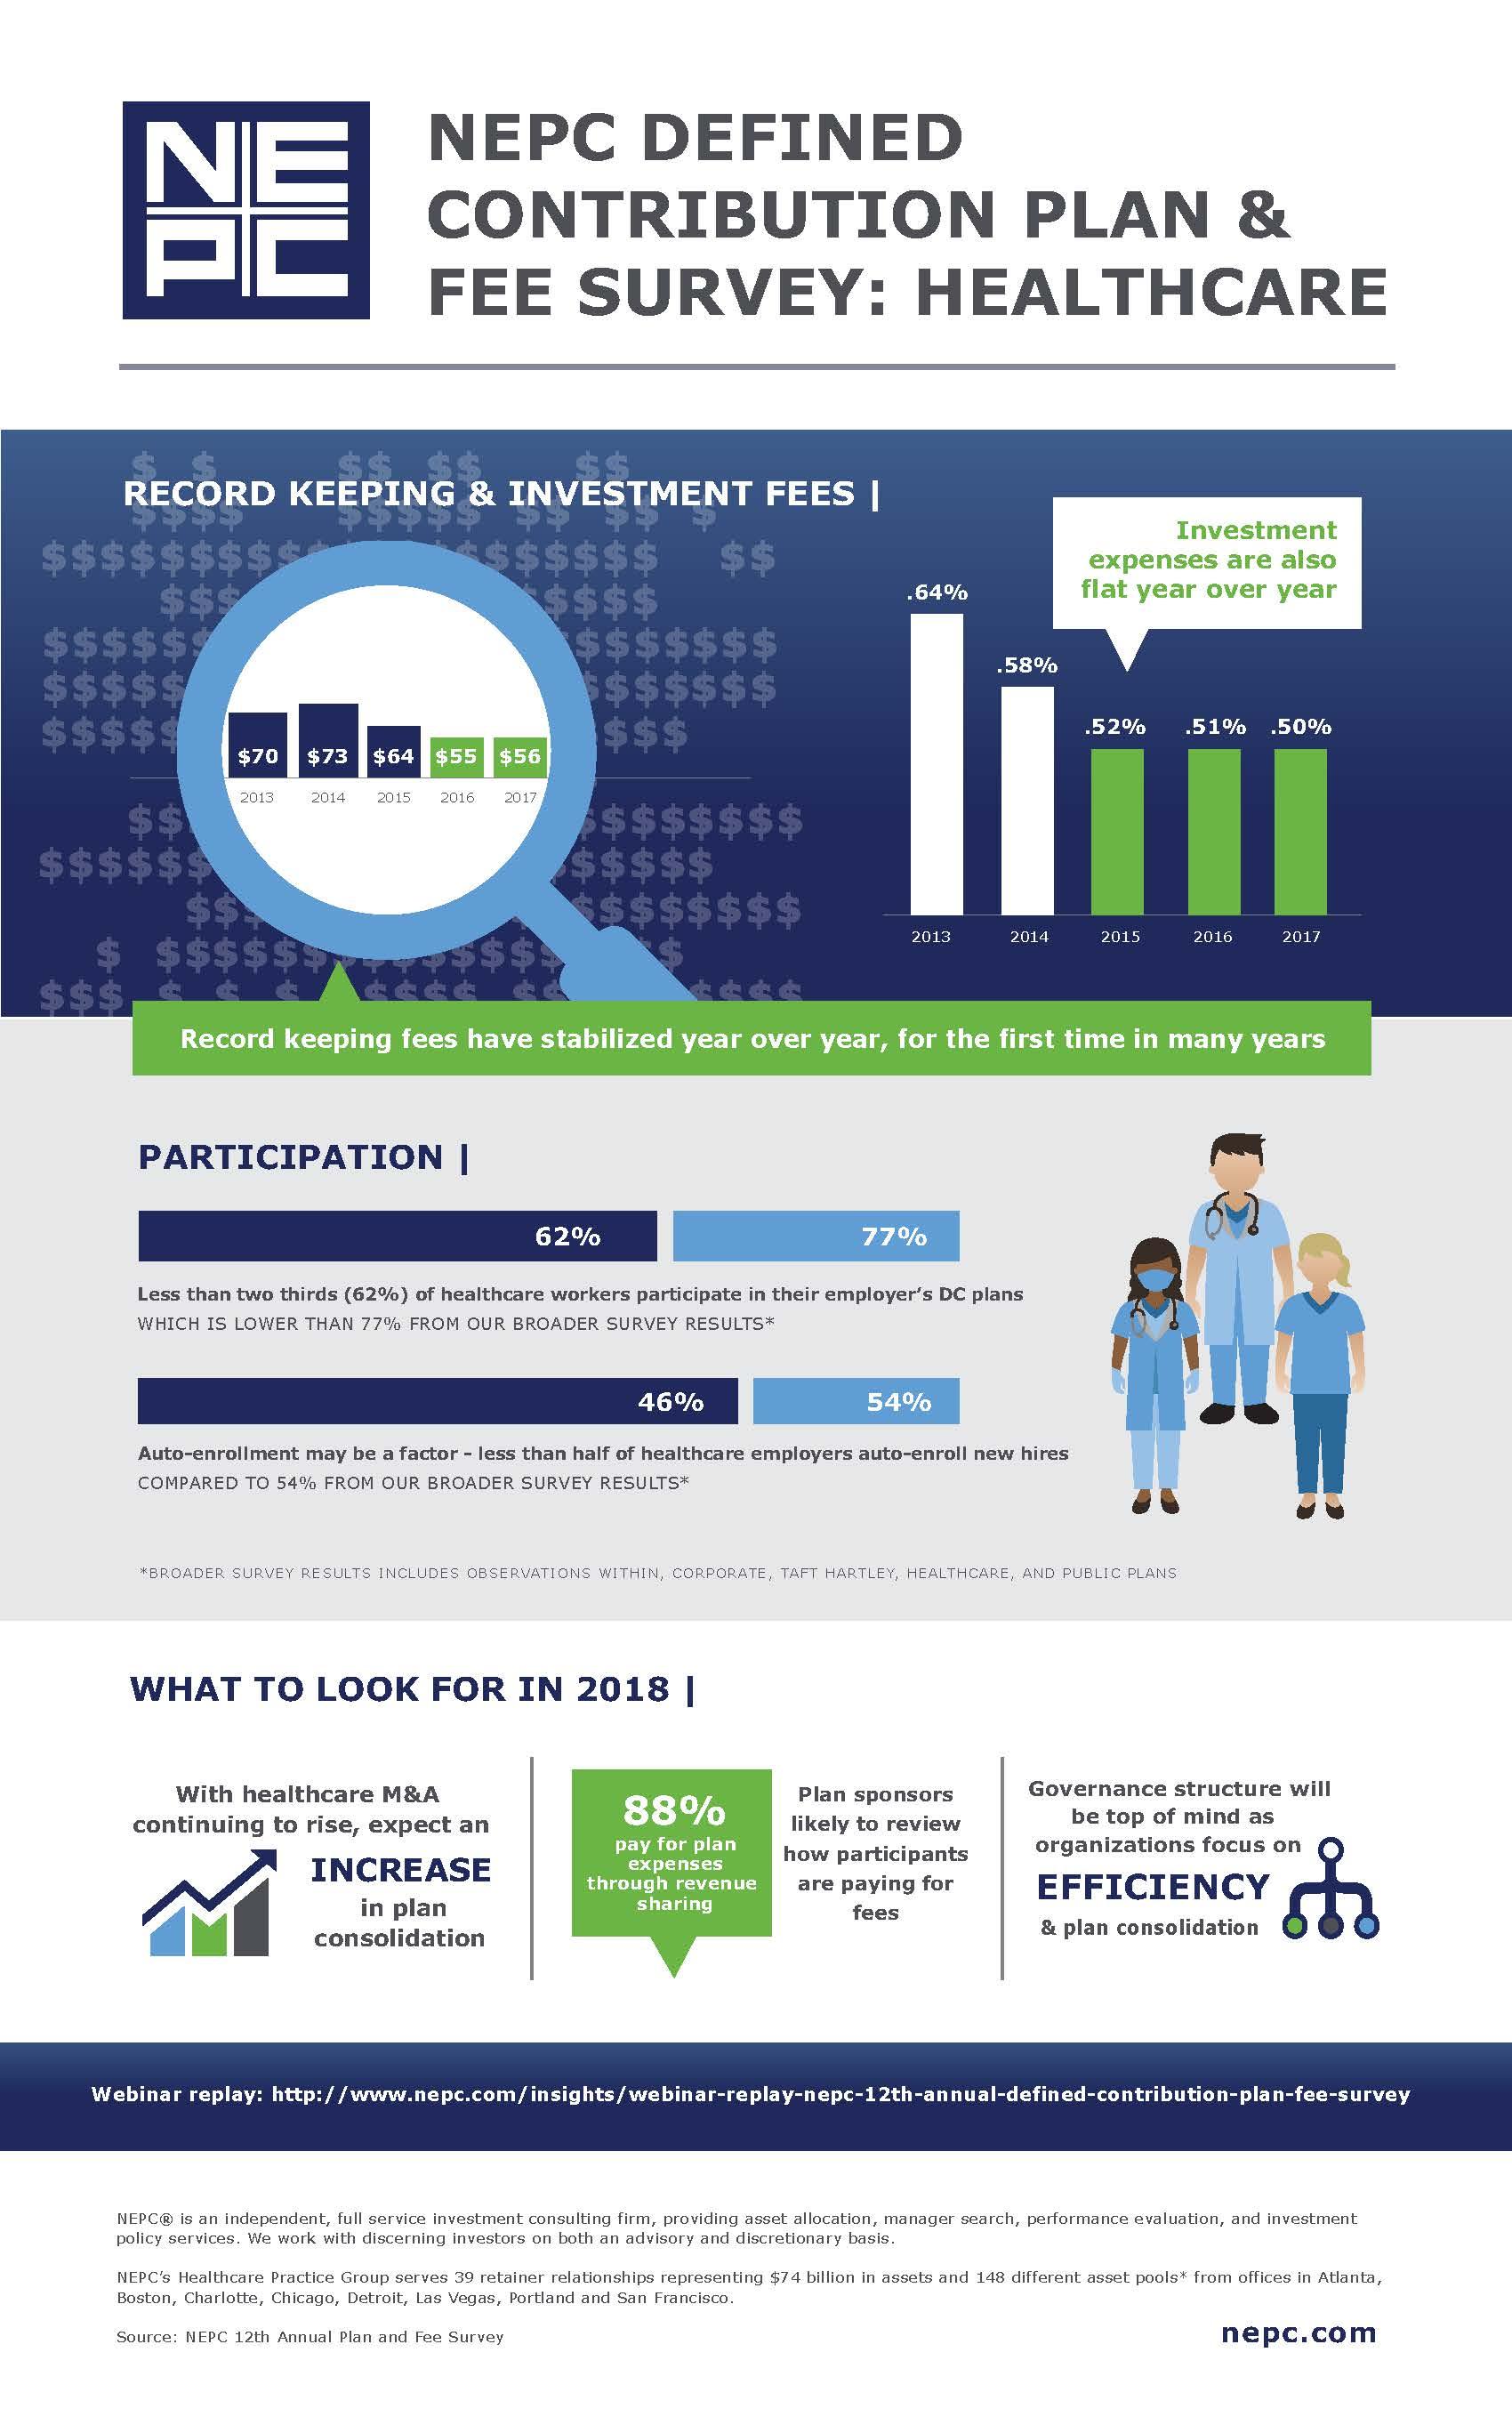 NEPC Defined Contribution Plan & Fee Survey: Healthcare